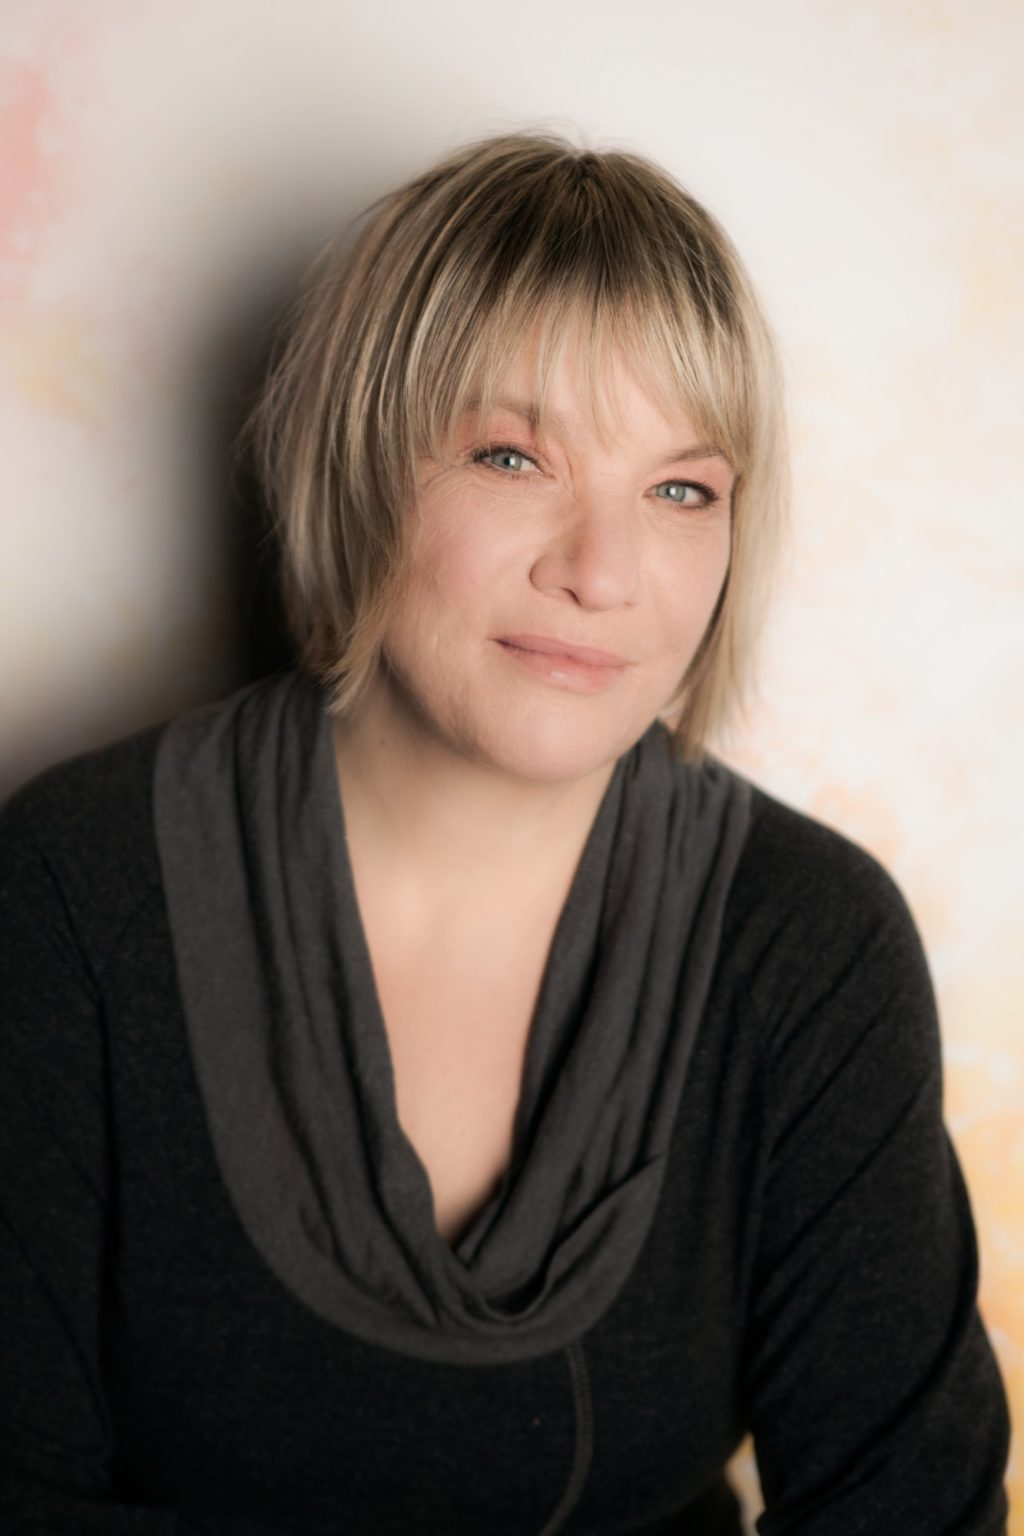 Dominique Quesnel